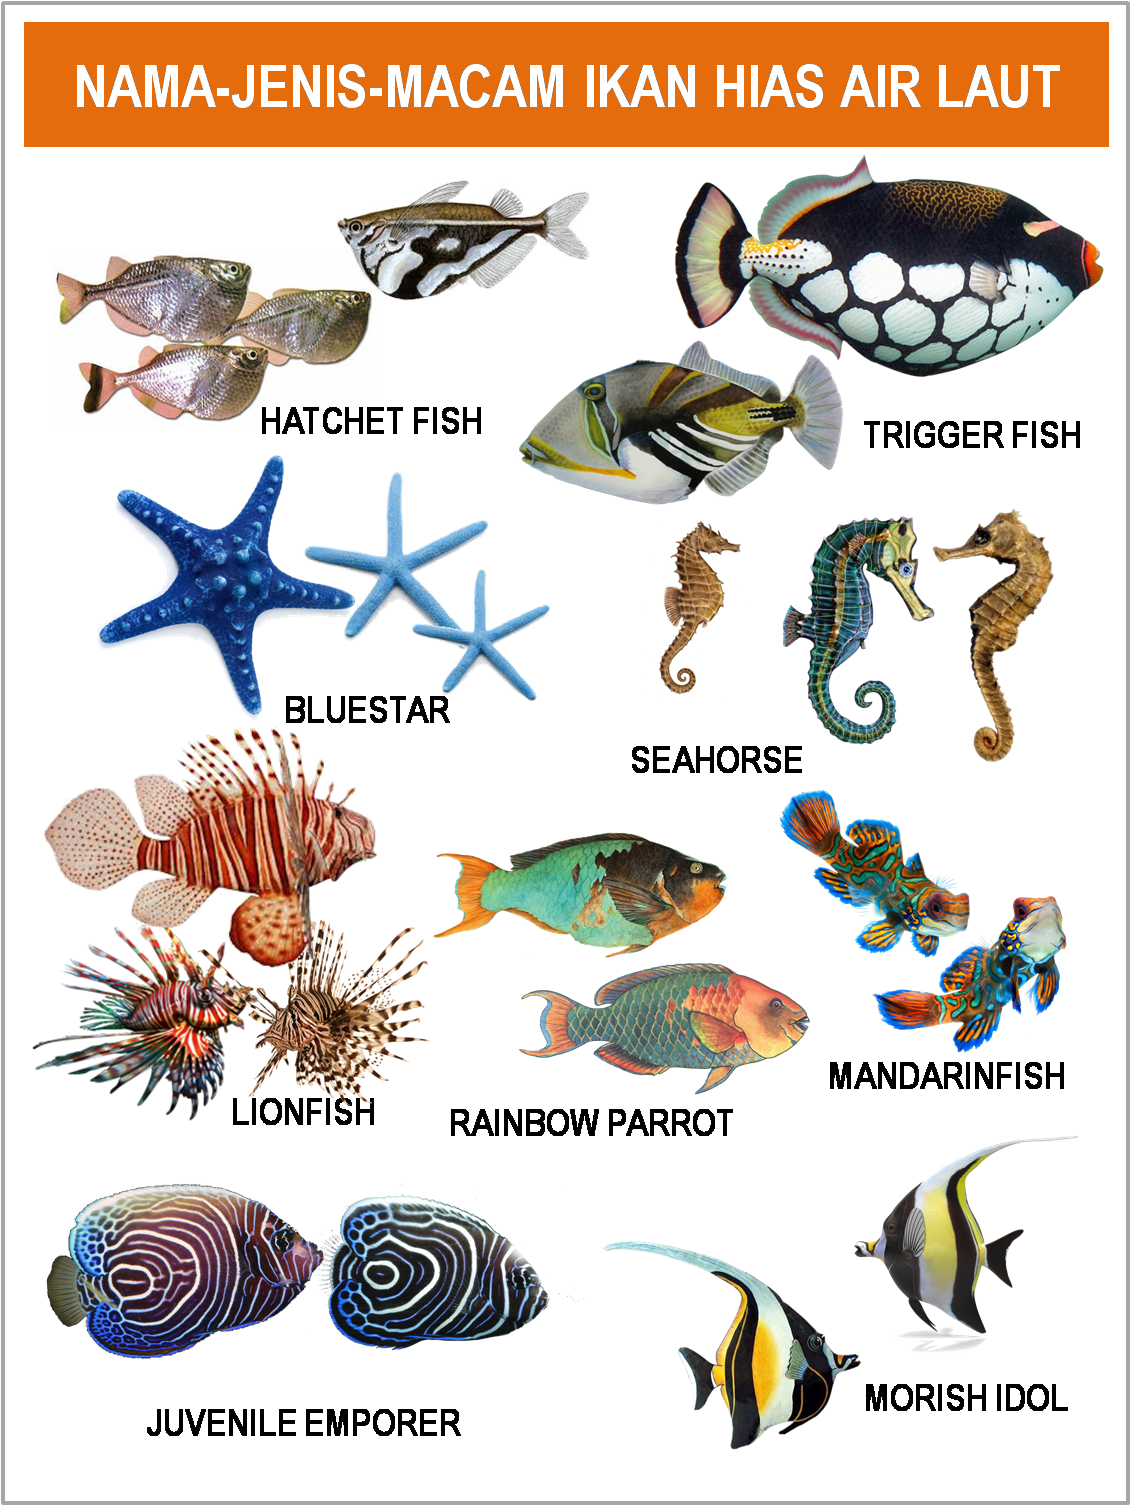 Jenis Ikan Hias Air Laut Dan Gambarnya Gambar Foto Jenis Macam Nama Ikan Hias Air Laut Freewaremini